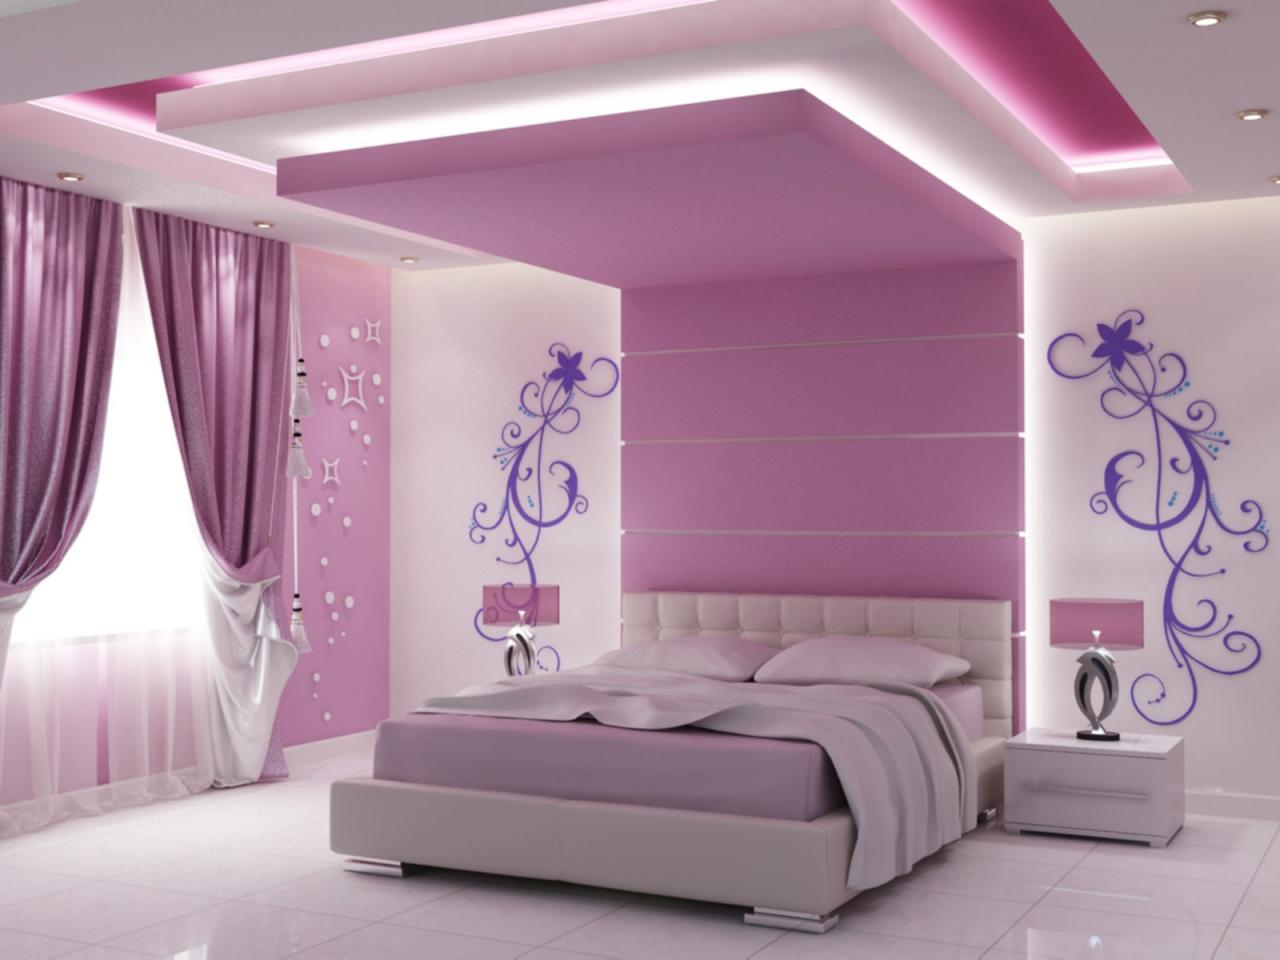 صورة صبغات غرف نوم , دهانات لغرف نوم حديثه